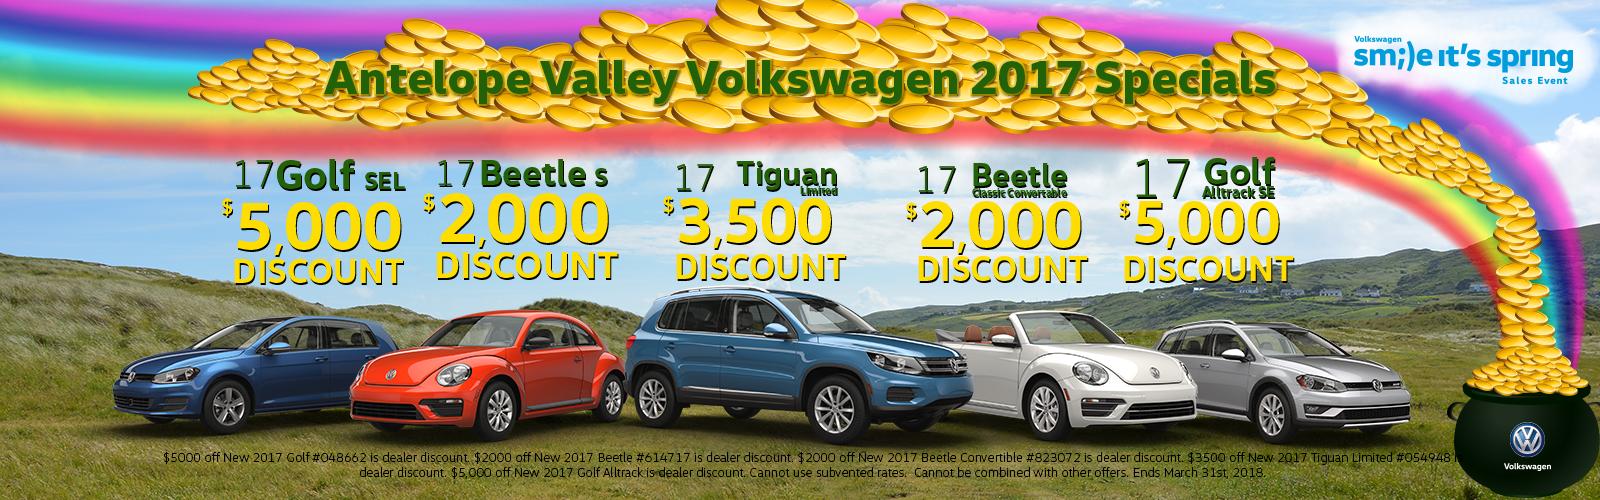 Antelope Valley Volkswagen Car Dealership Palmdale Autos